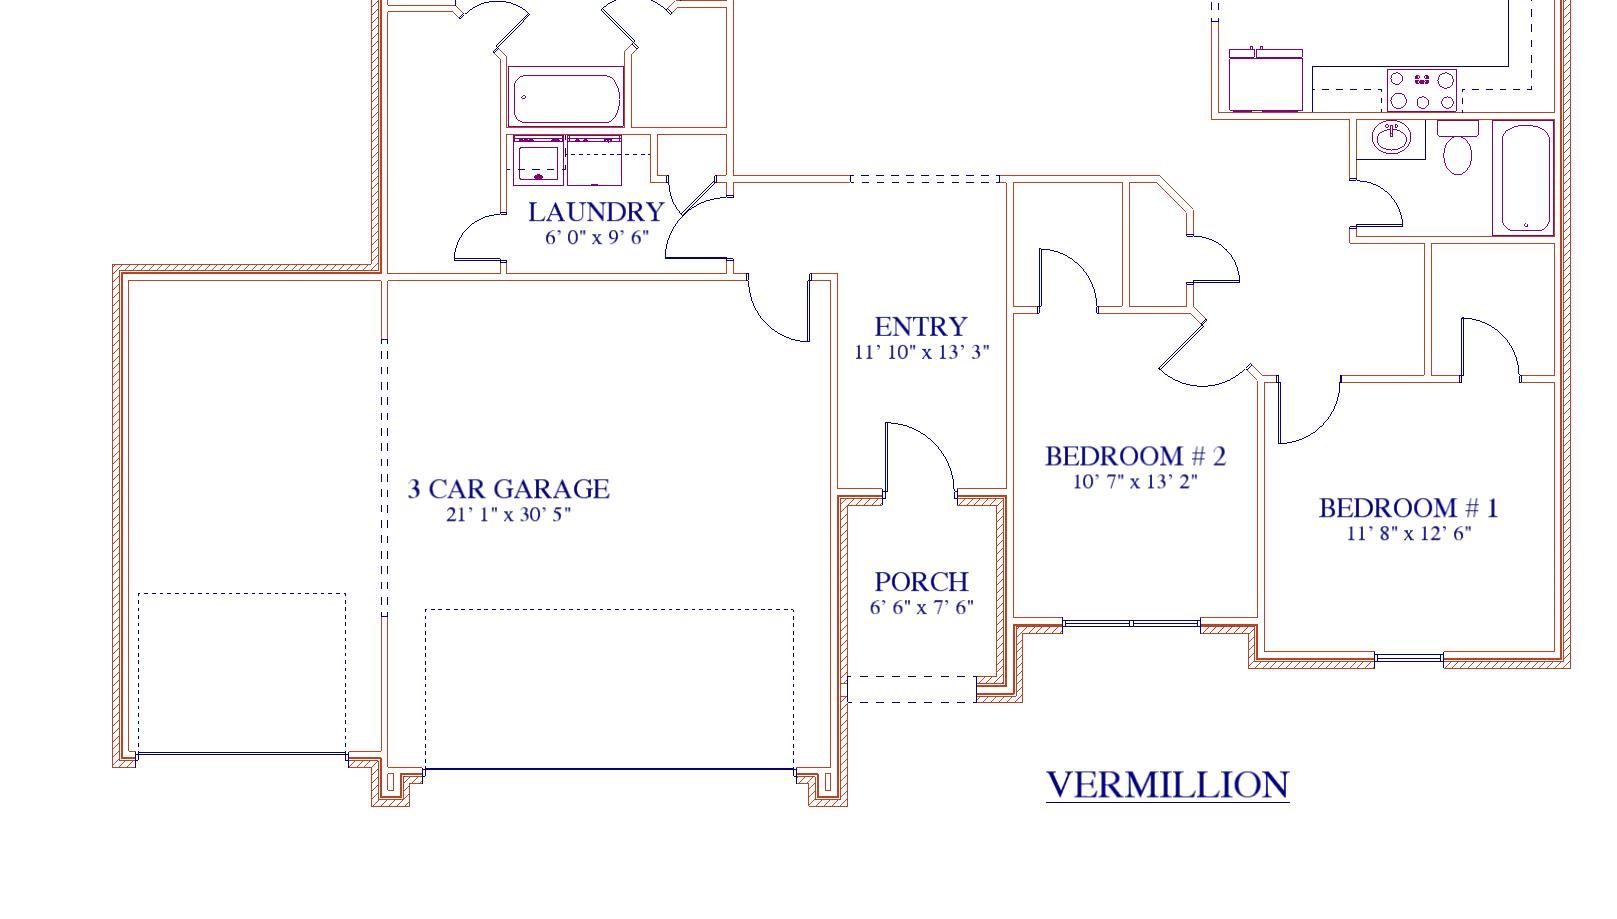 Vermillion Option - 3-Car Garage - Custom Homes in SE Texas